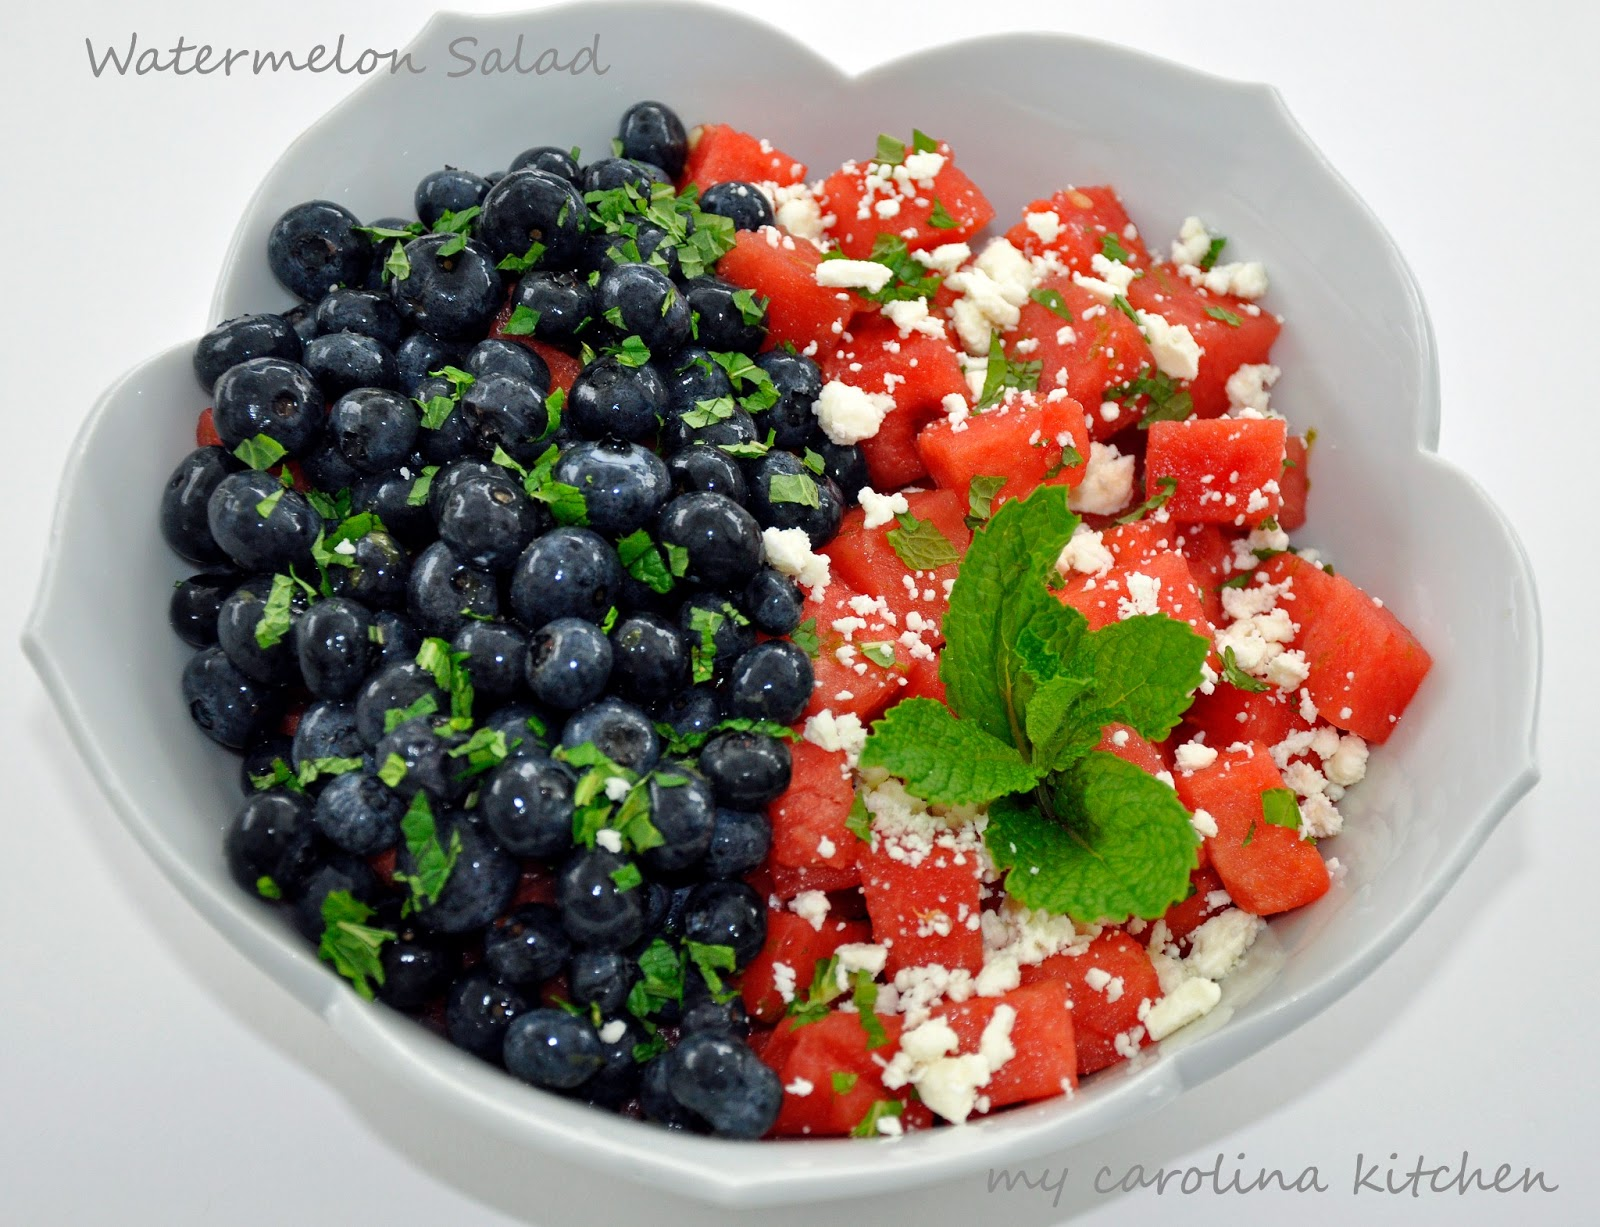 My Carolina Kitchen: Red, White, and Blue Watermelon Salad